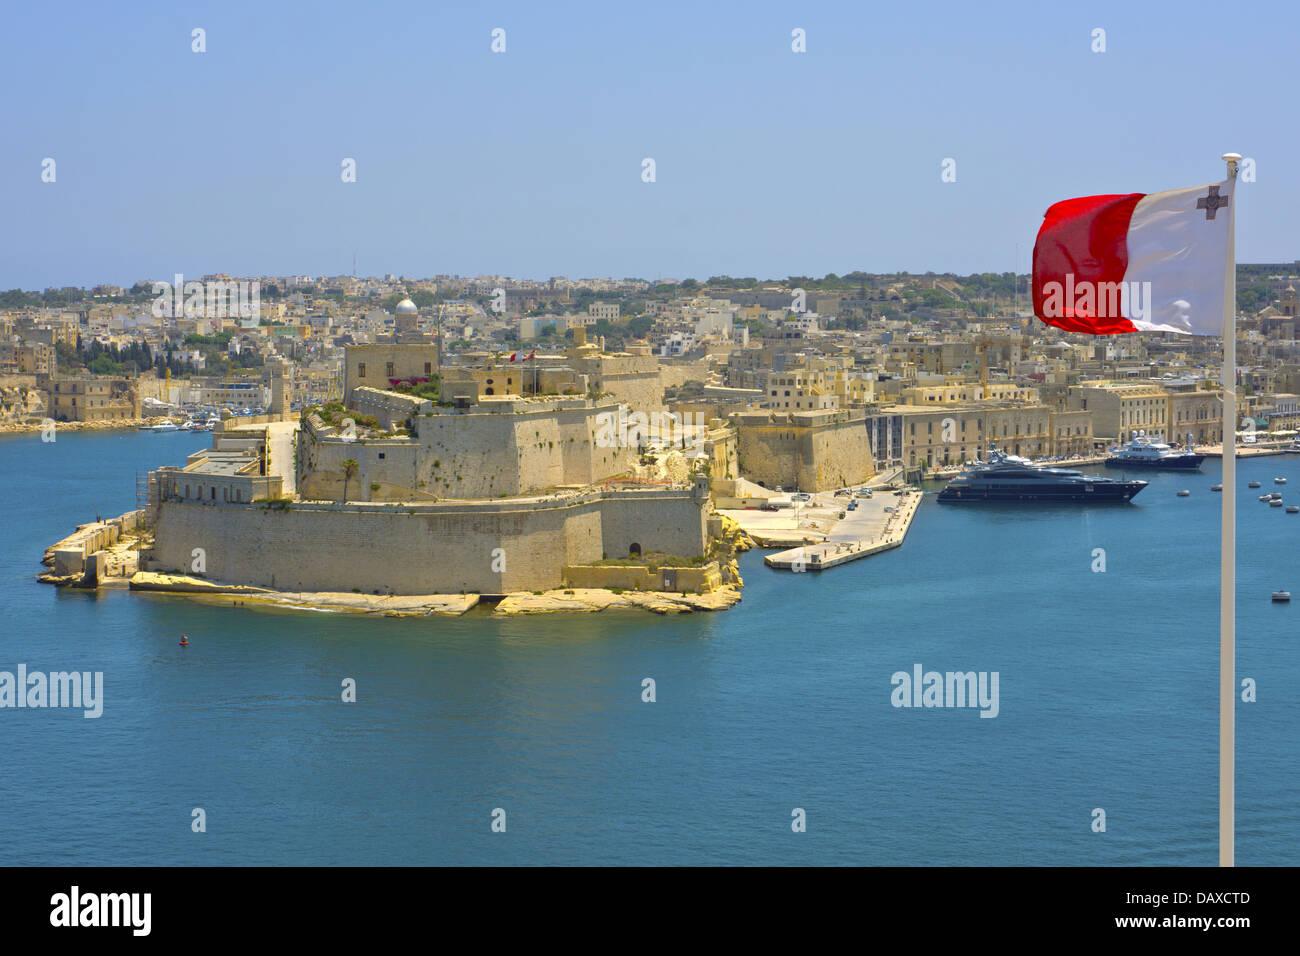 View Of Grand Harbour, Valletta, Malta. - Stock Image